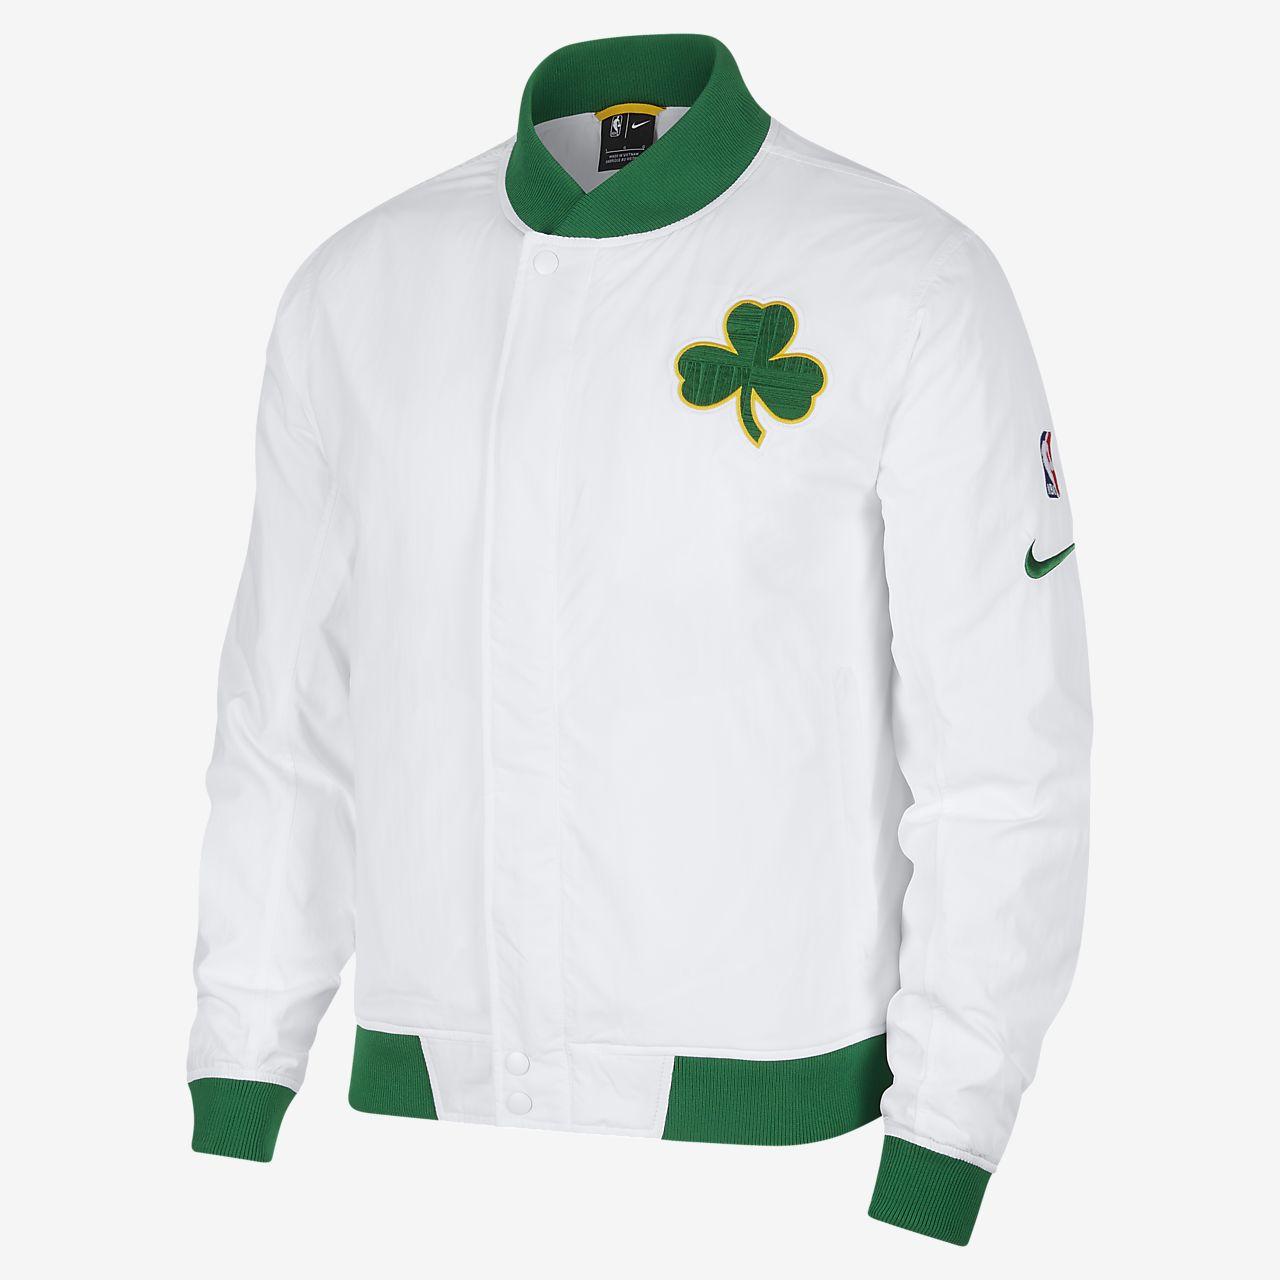 5e36b28baad Veste NBA Boston Celtics Nike Courtside pour Homme. Nike.com FR